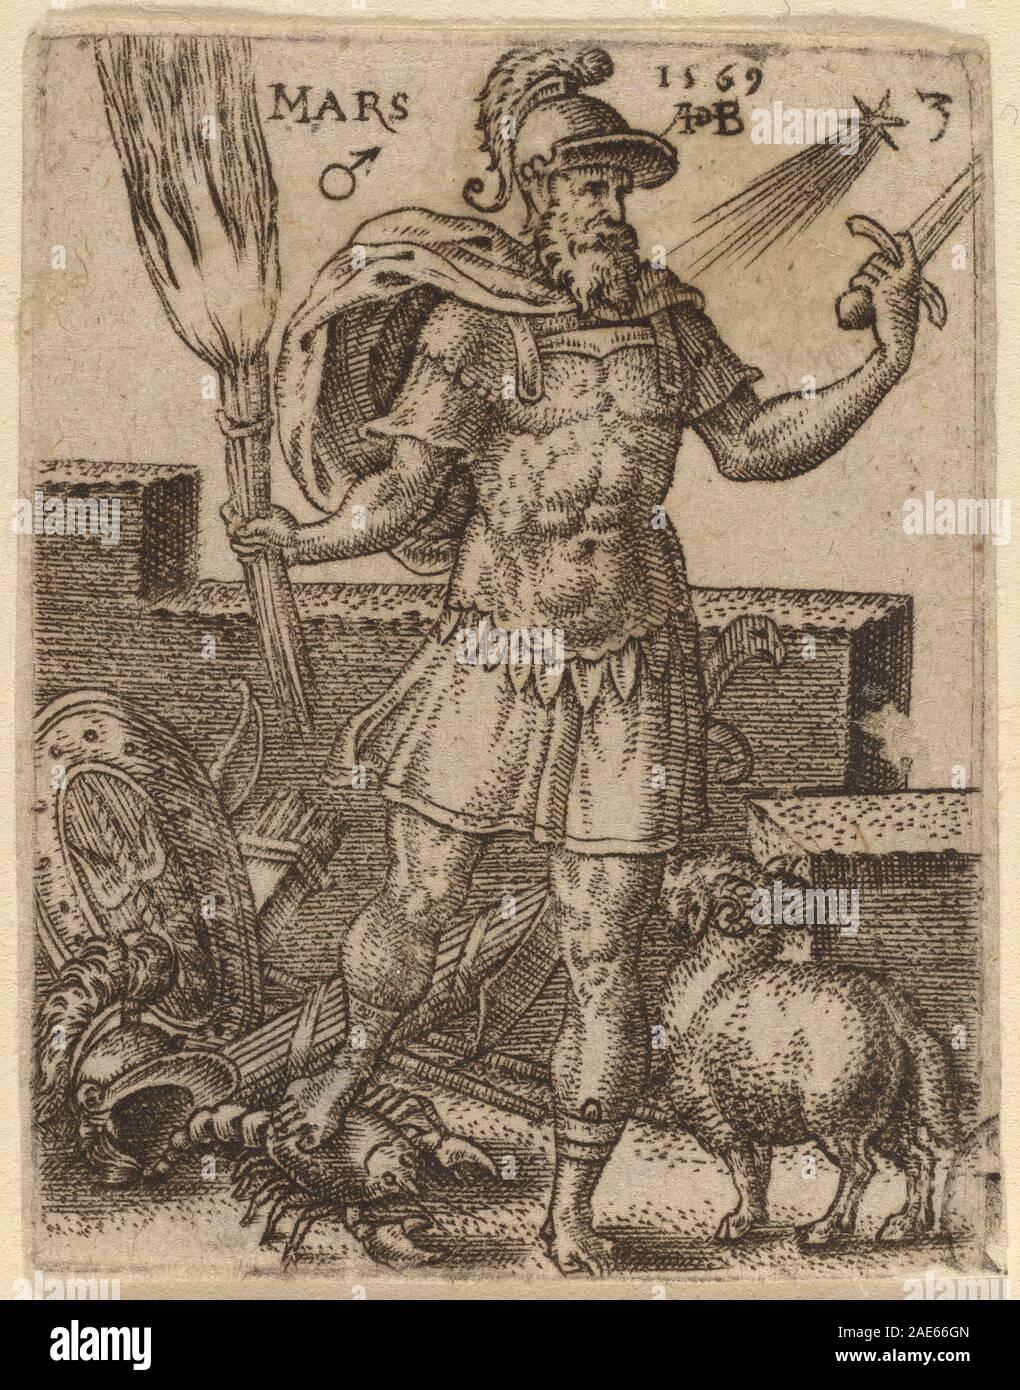 Mars; 1569date Abraham de Bruyn, Mars, 1569 Stock Photo